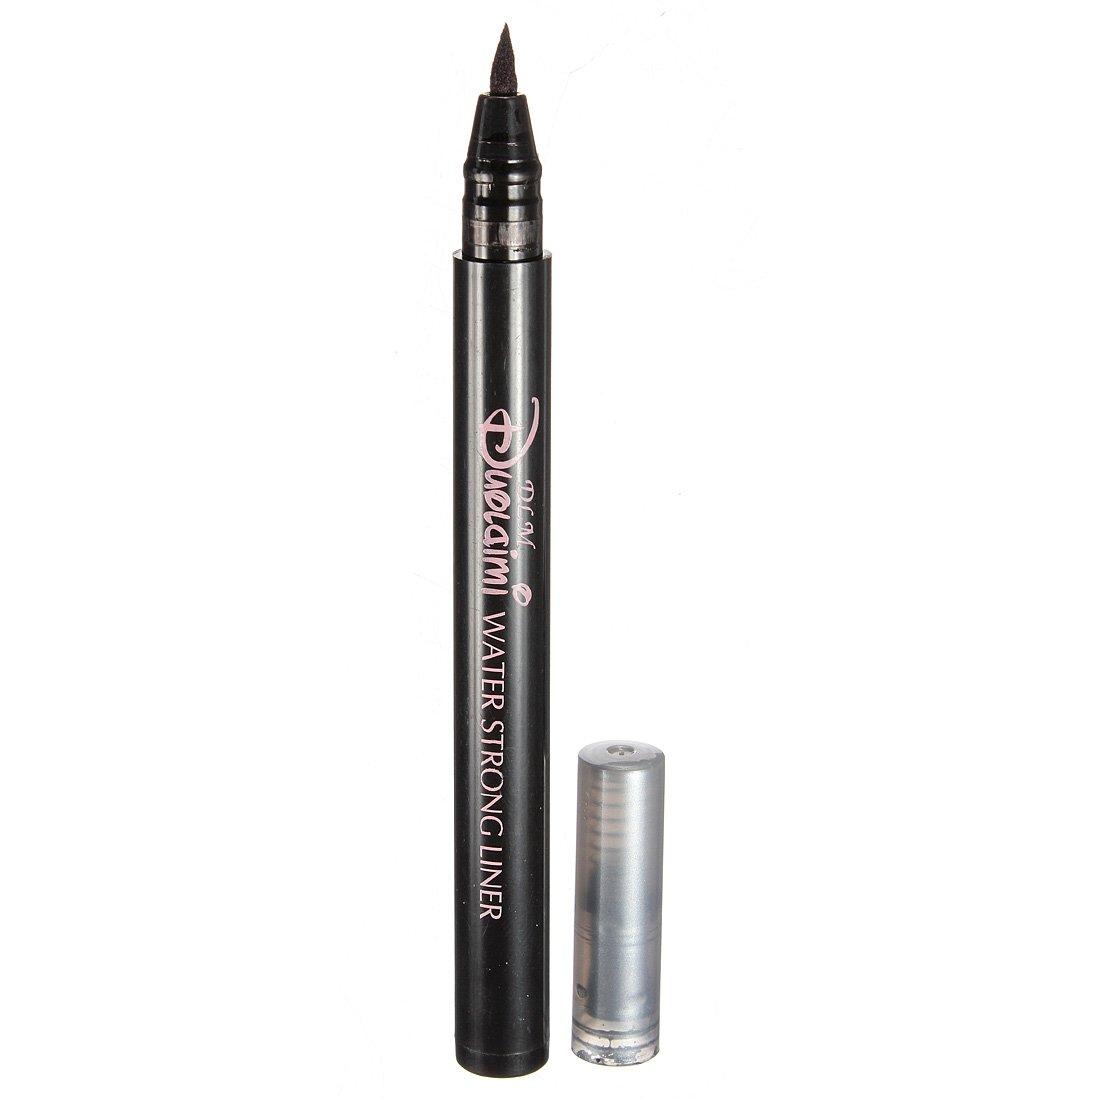 IRISMARU Makeup Black Soft Waterproof Long-lasting Eyeliner Liquid Pen Pencil